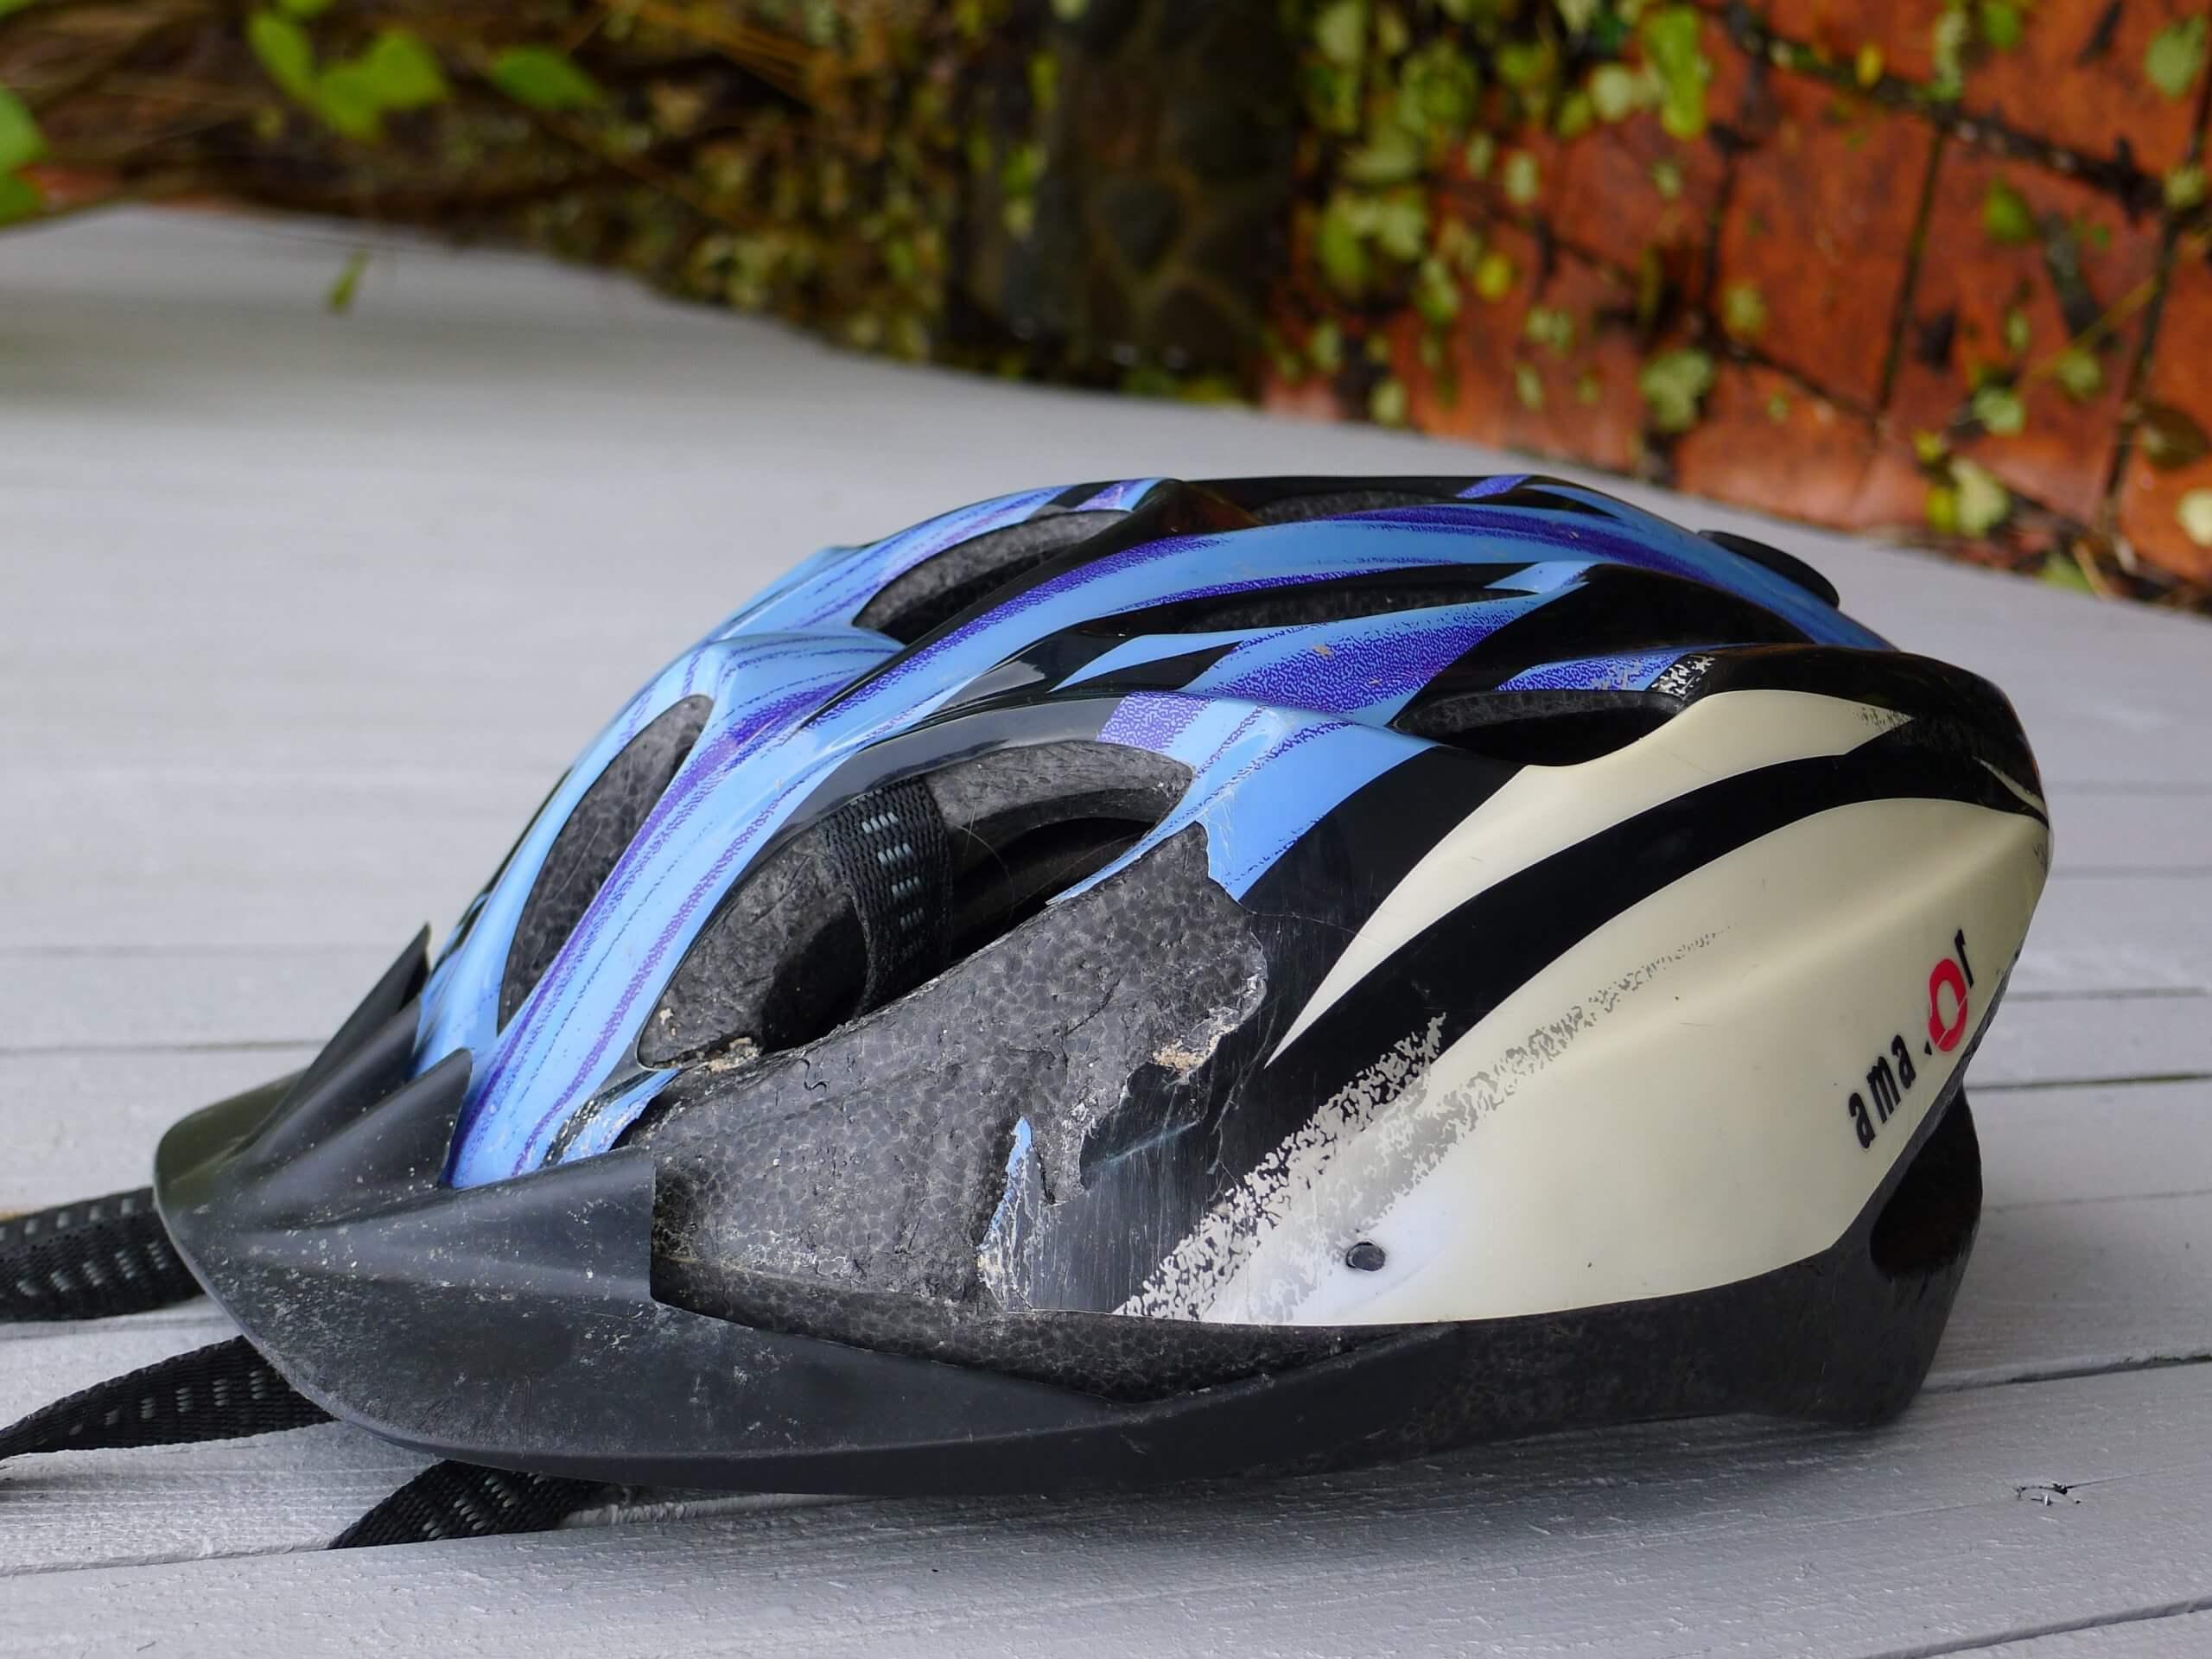 bicycle accident helmet after crash